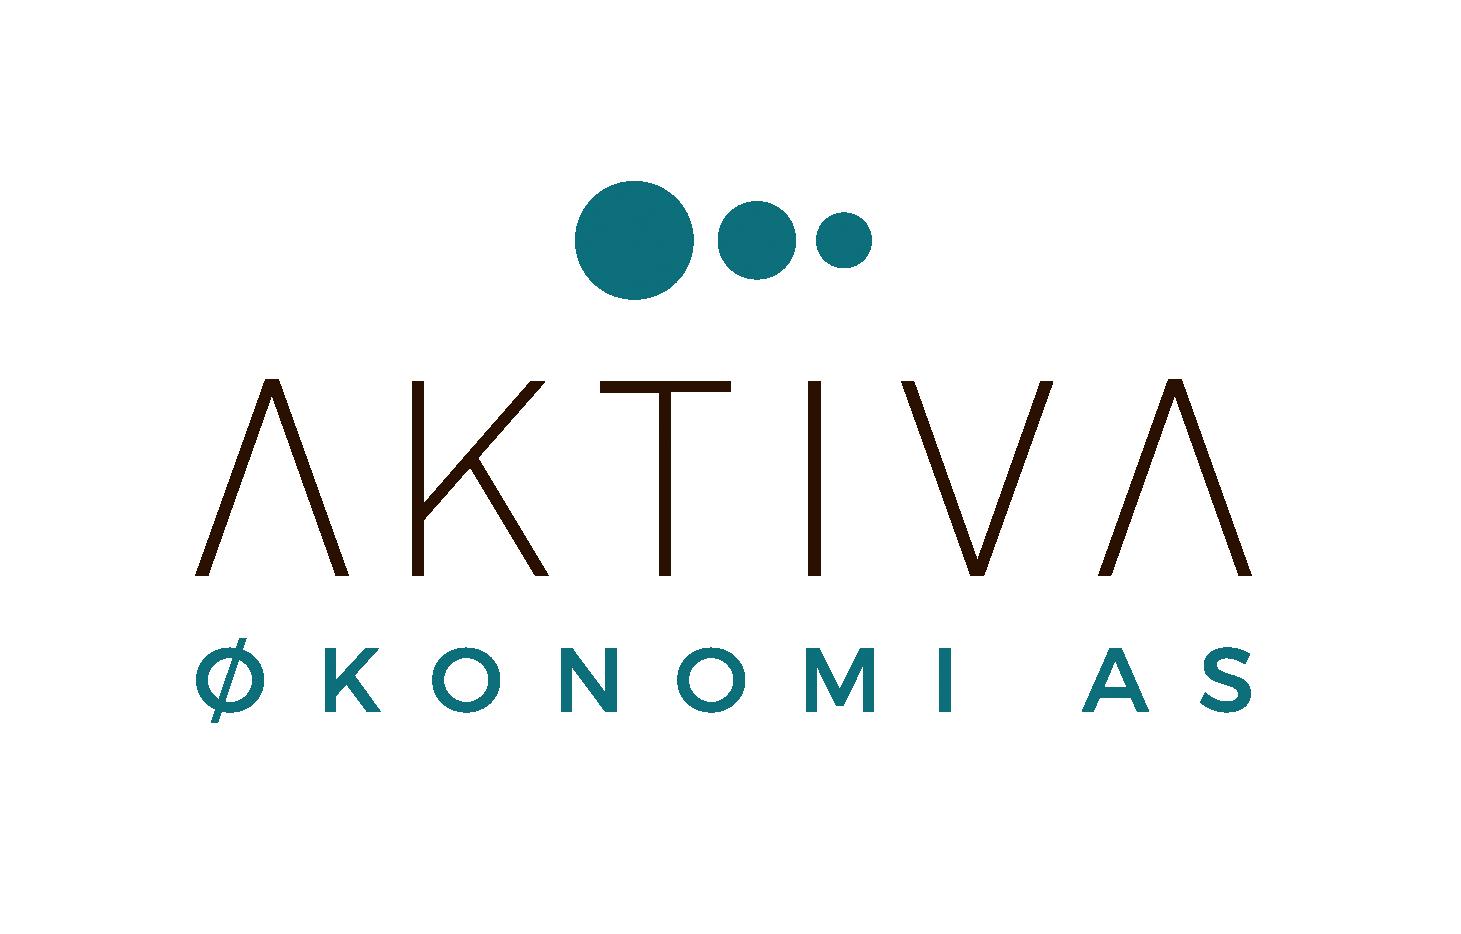 Aktiva Økonomi